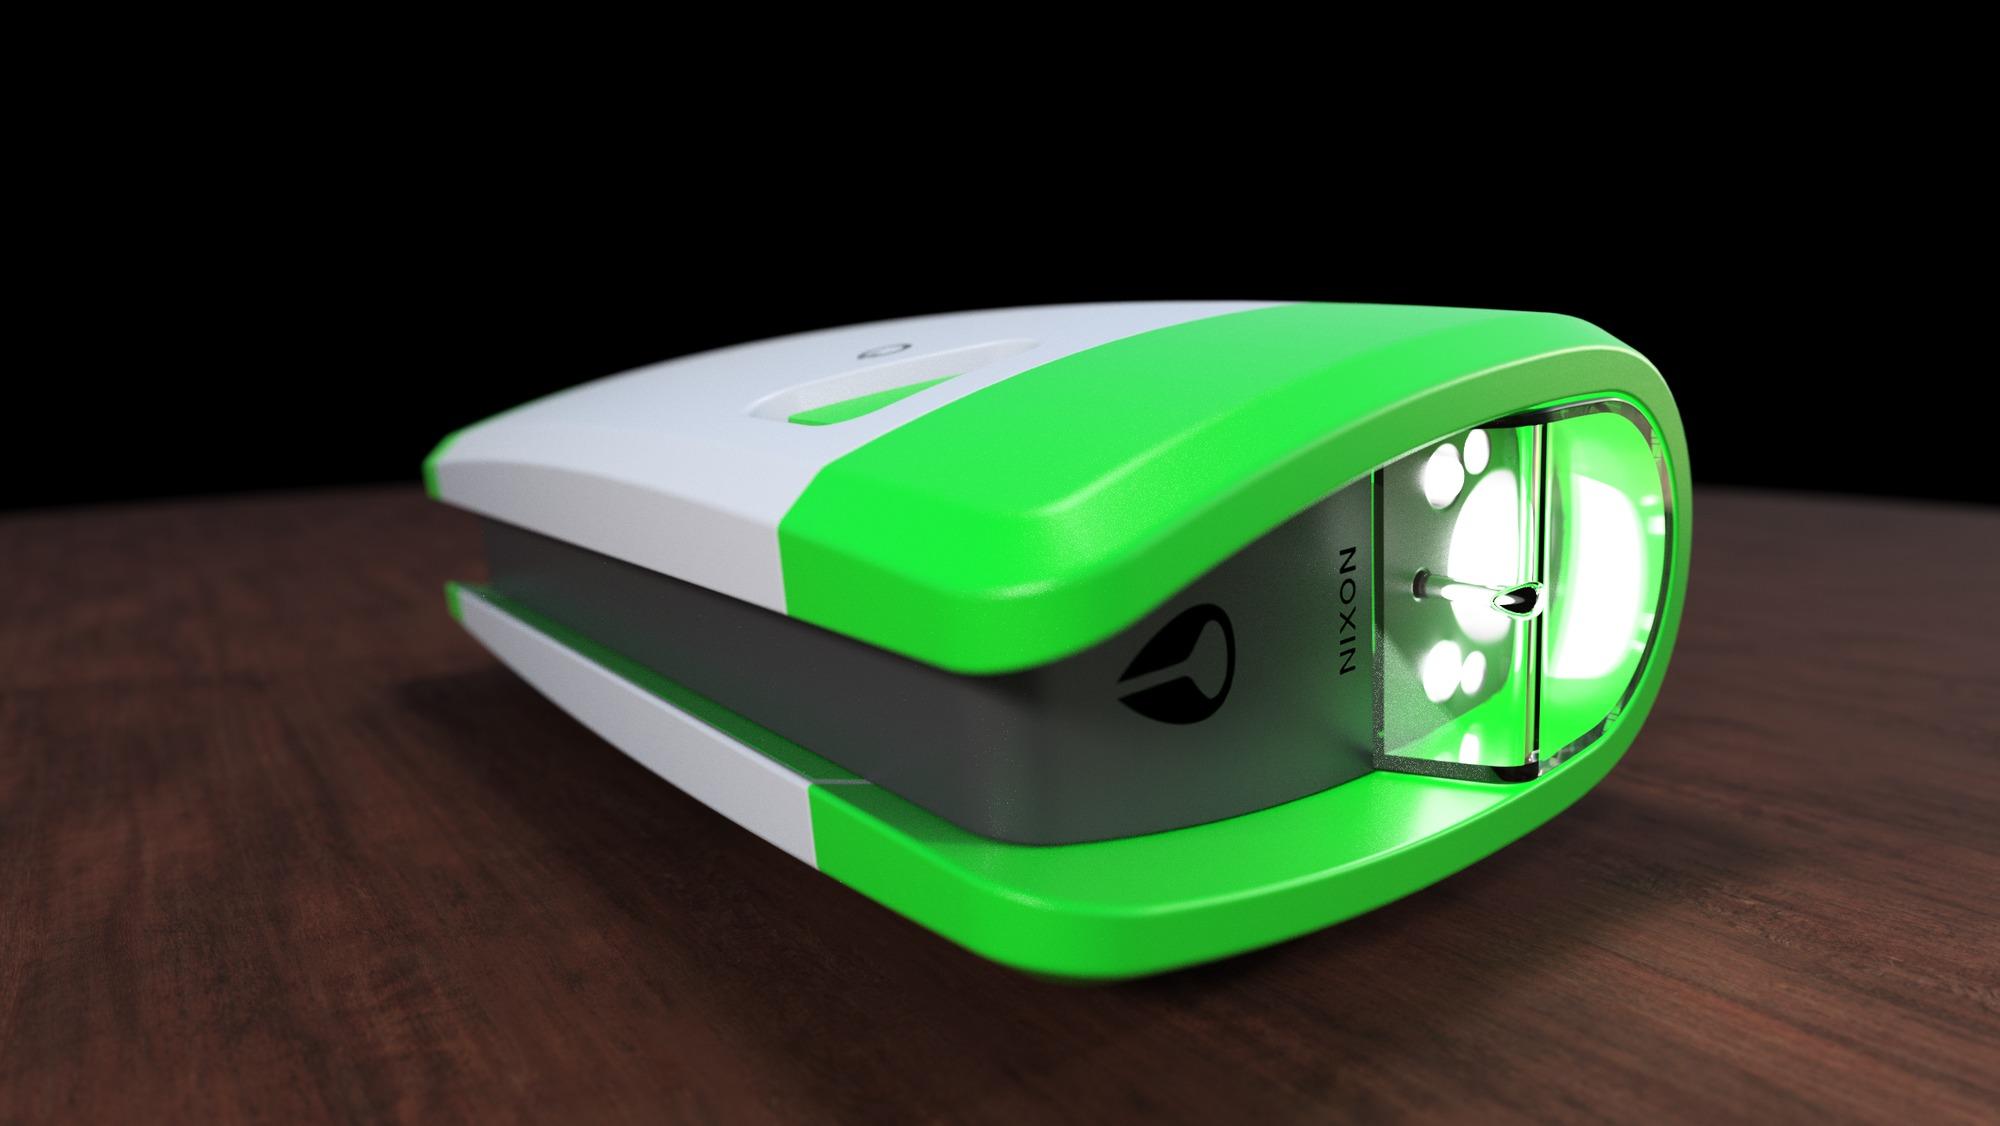 Flashlight_design_workflow_2015-oct-01_10-43-44pm-000_customizedview44761405